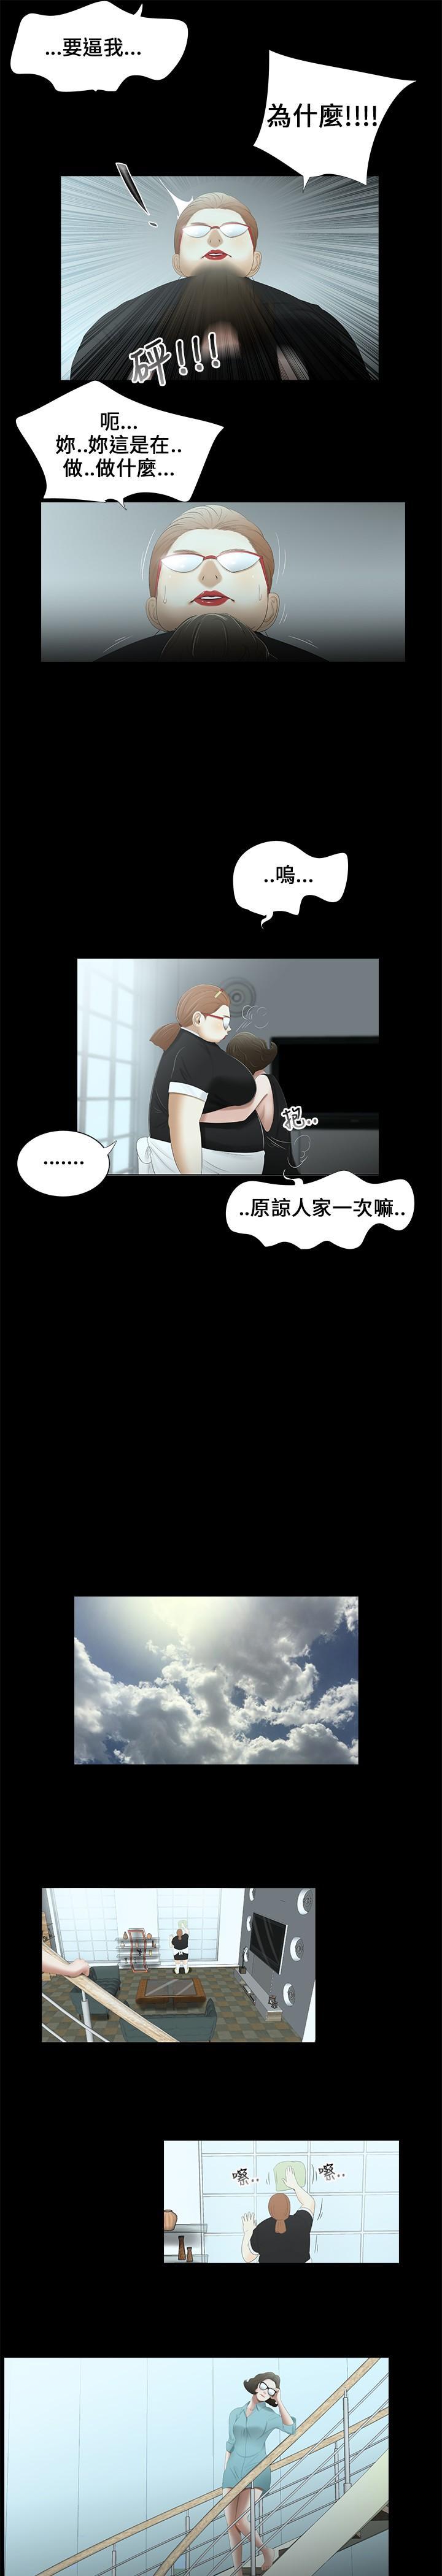 Three sisters 三姐妹Ch.13~19 (Chinese)中文 49